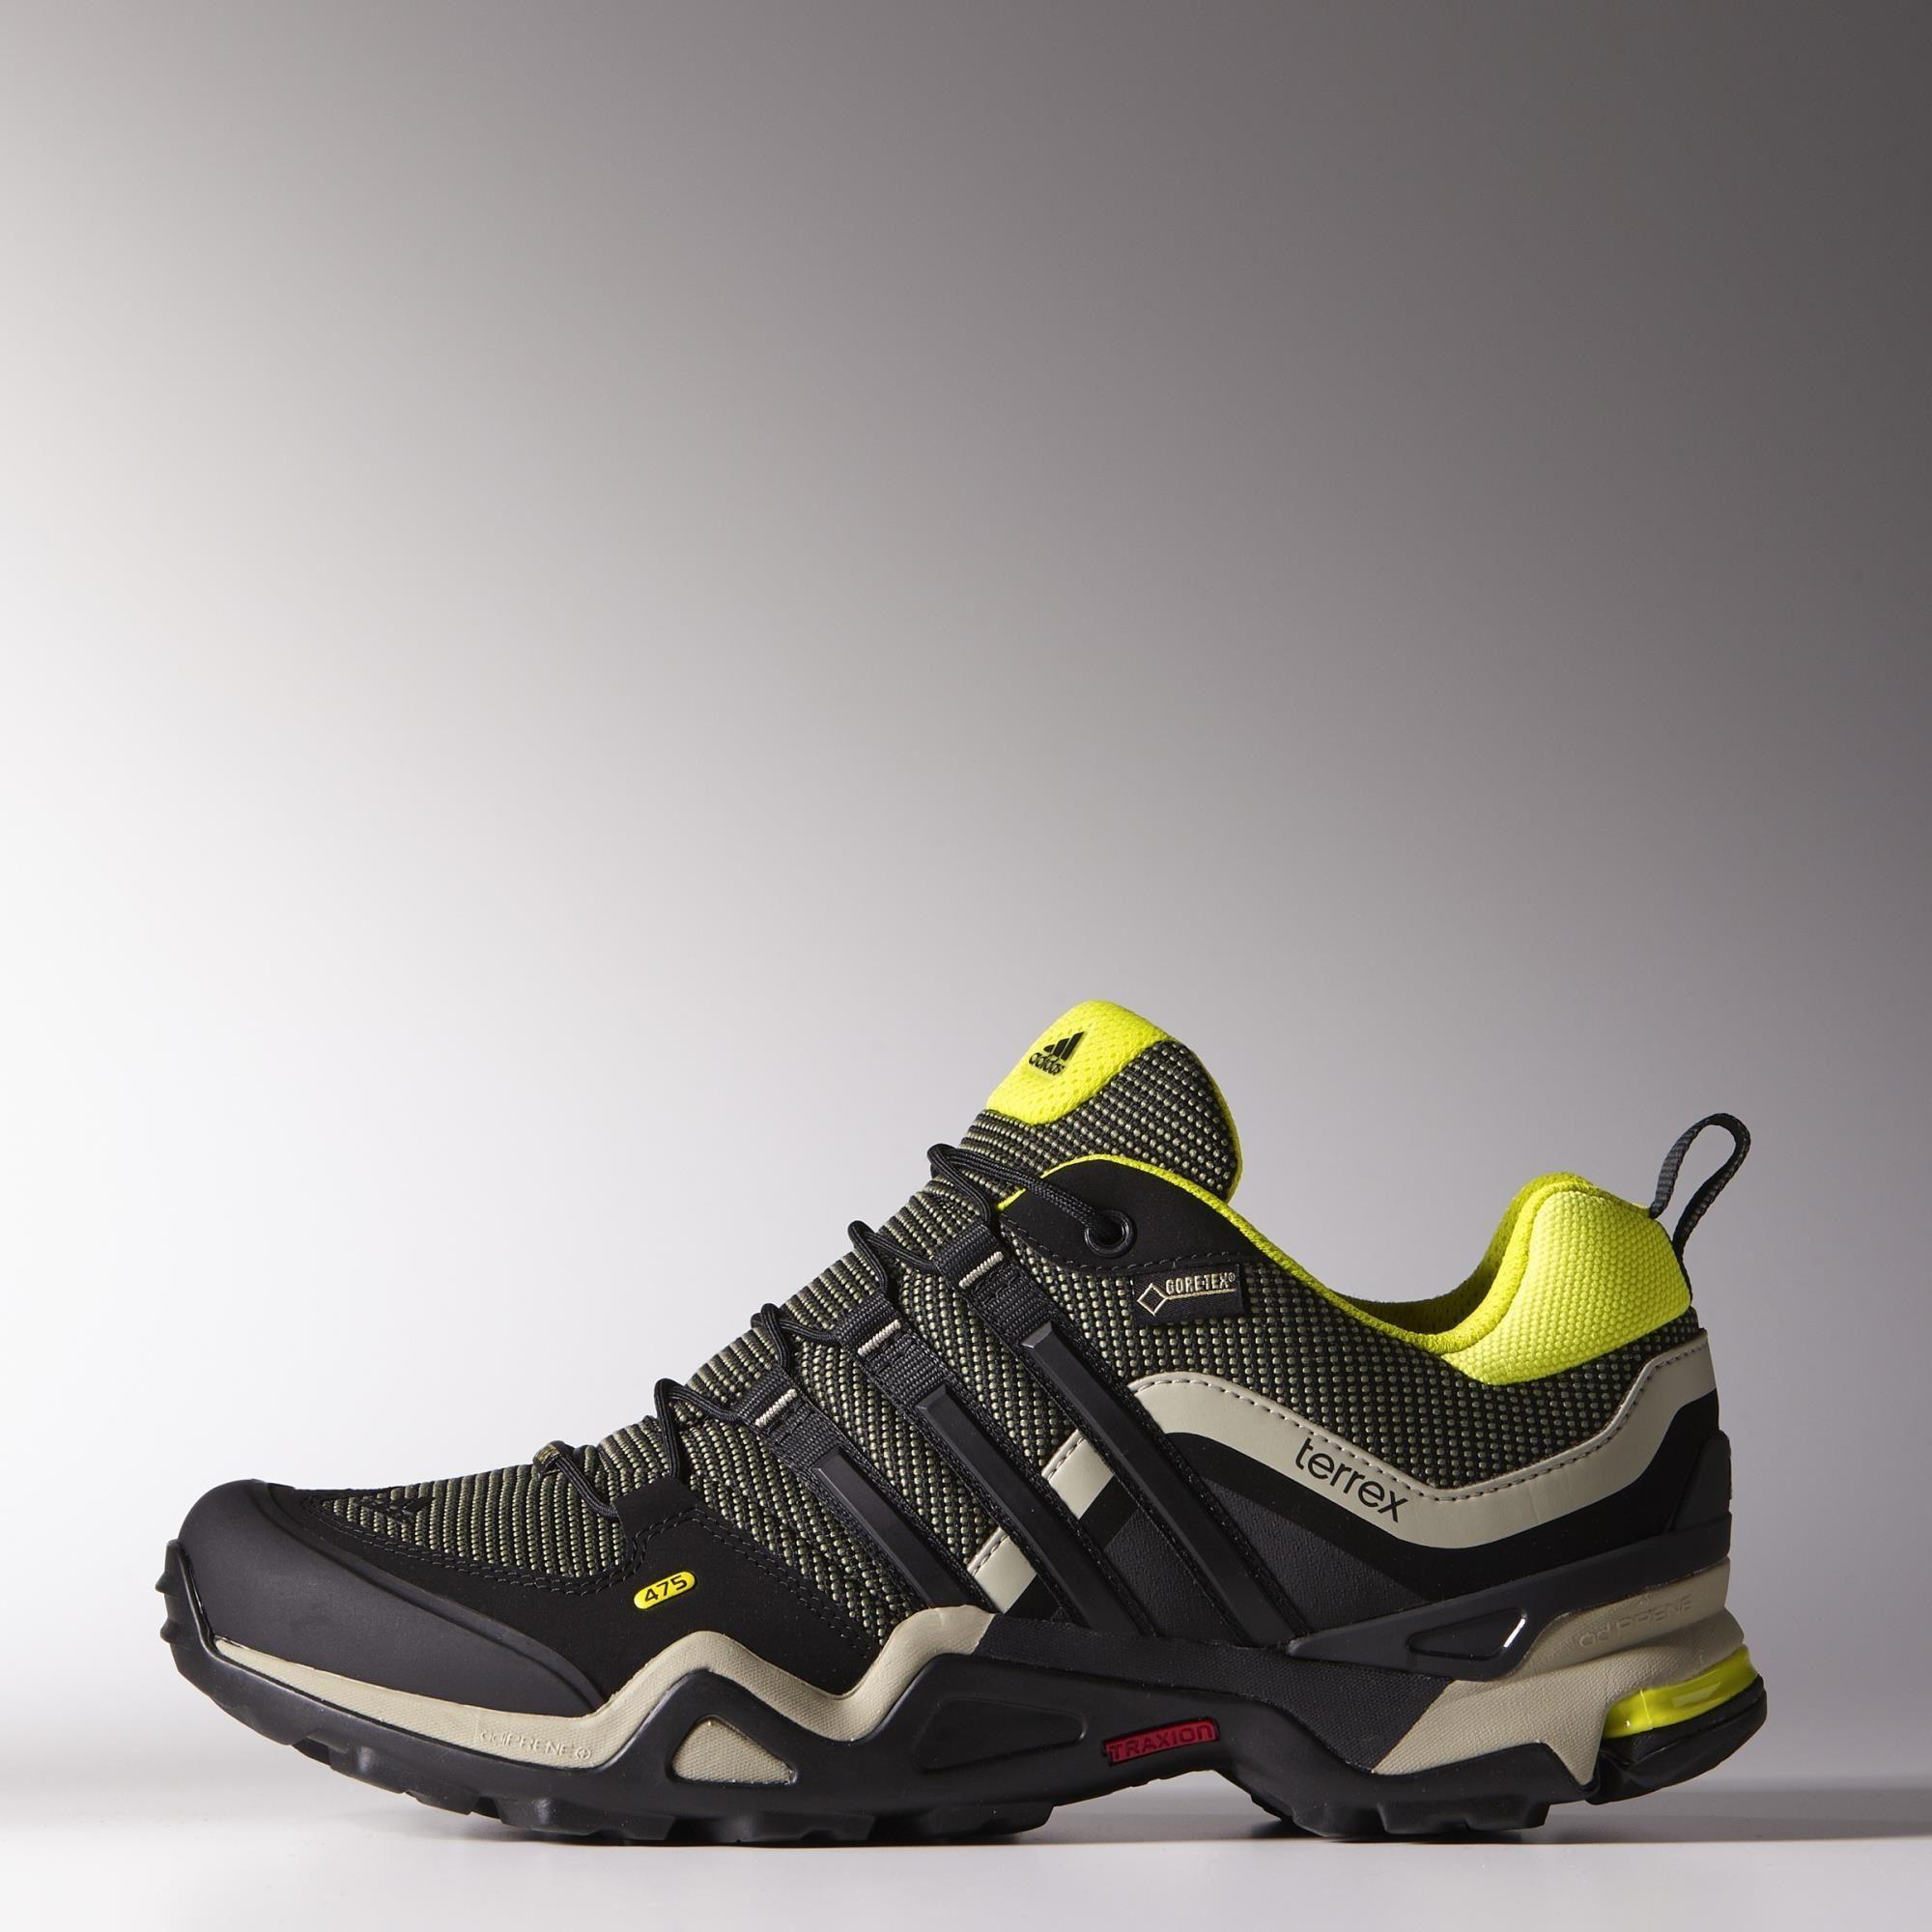 adidas Terrex Fast X GTX | Shoes | Adidas, Shoes, Adidas shoes